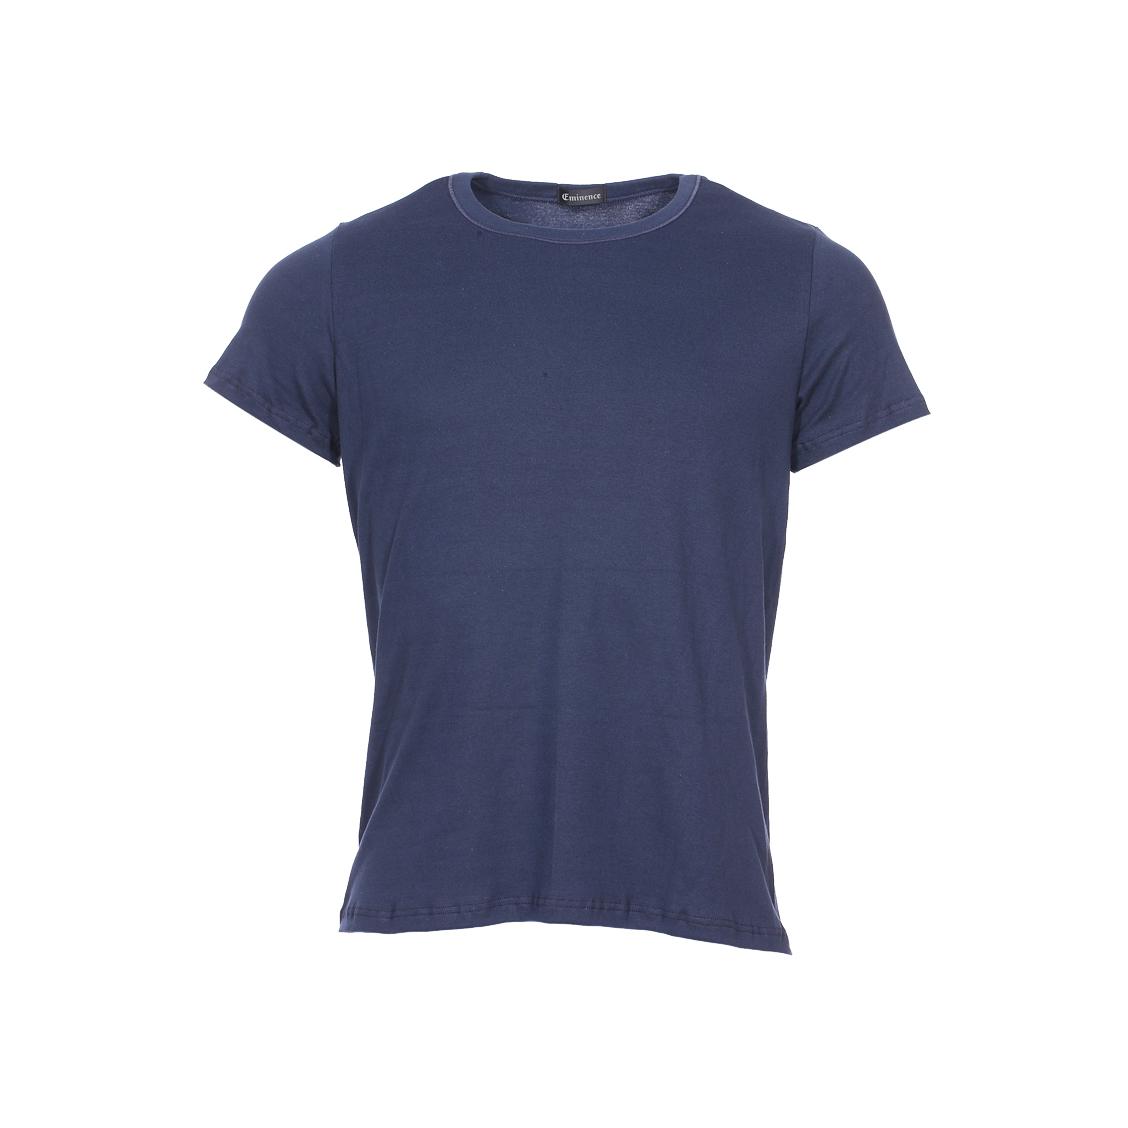 Tee-shirt col rond Eminence L'Optimum en coton bleu marine, tissu français